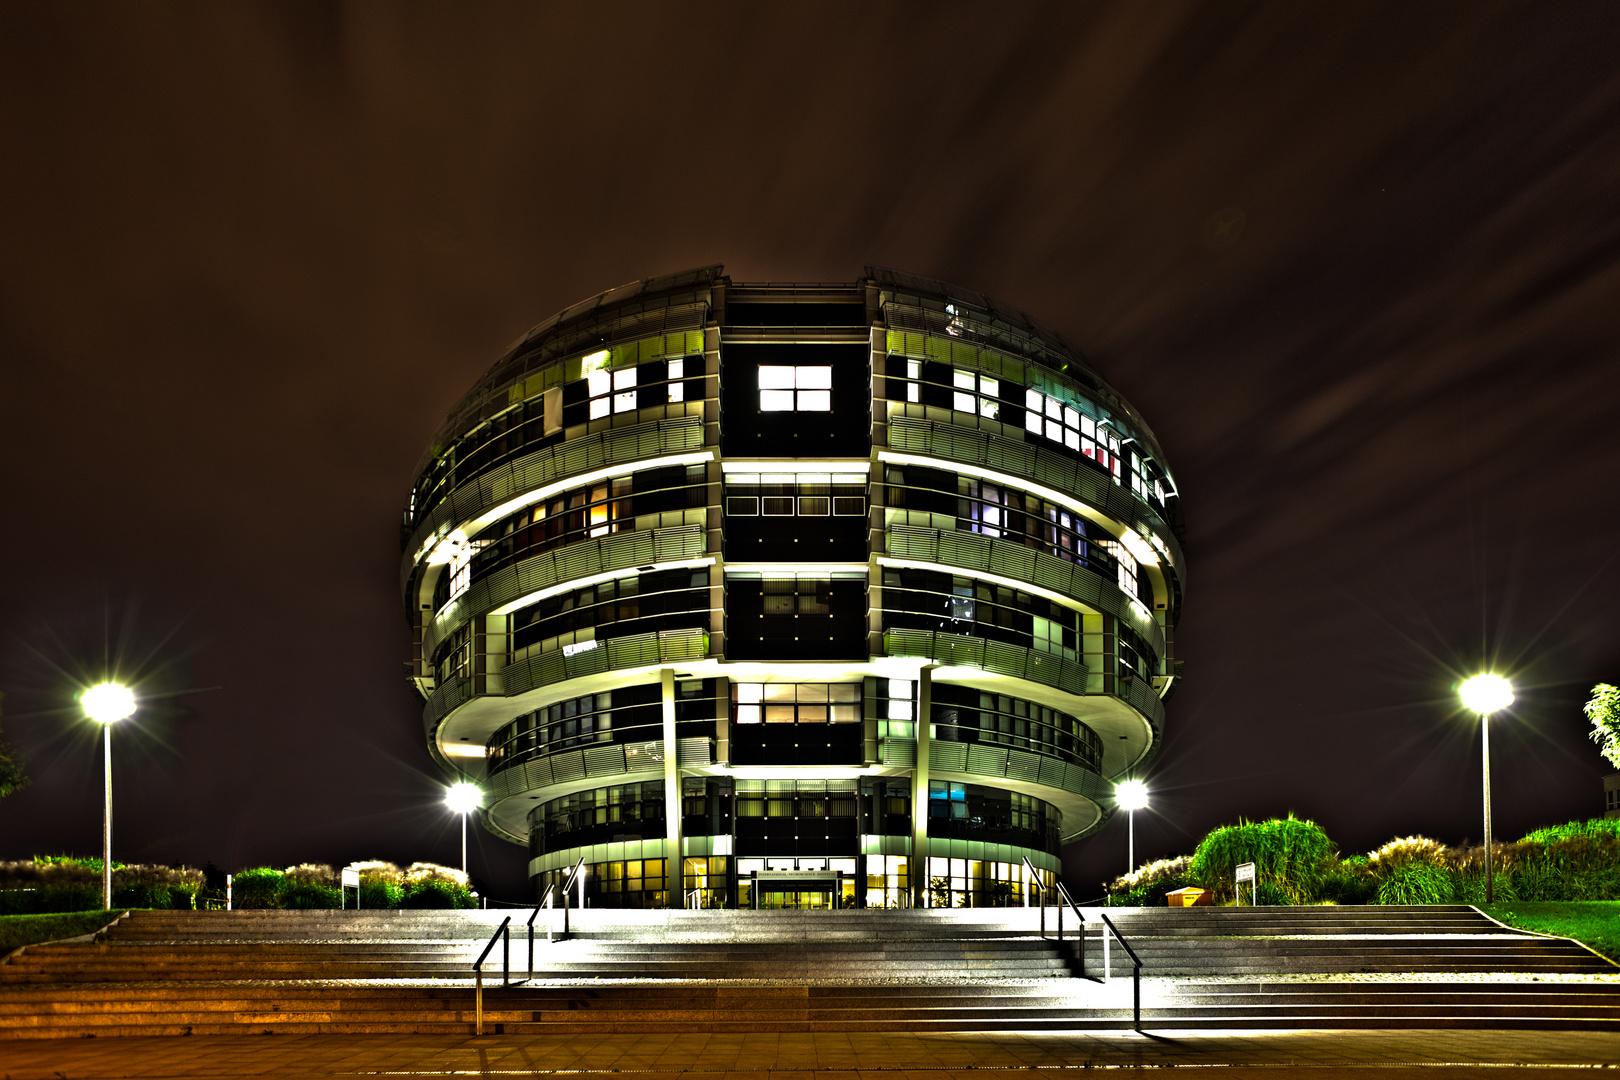 INI International Neuroscience Institute Neurologiezentrum in Hannover bei Nacht als HDR